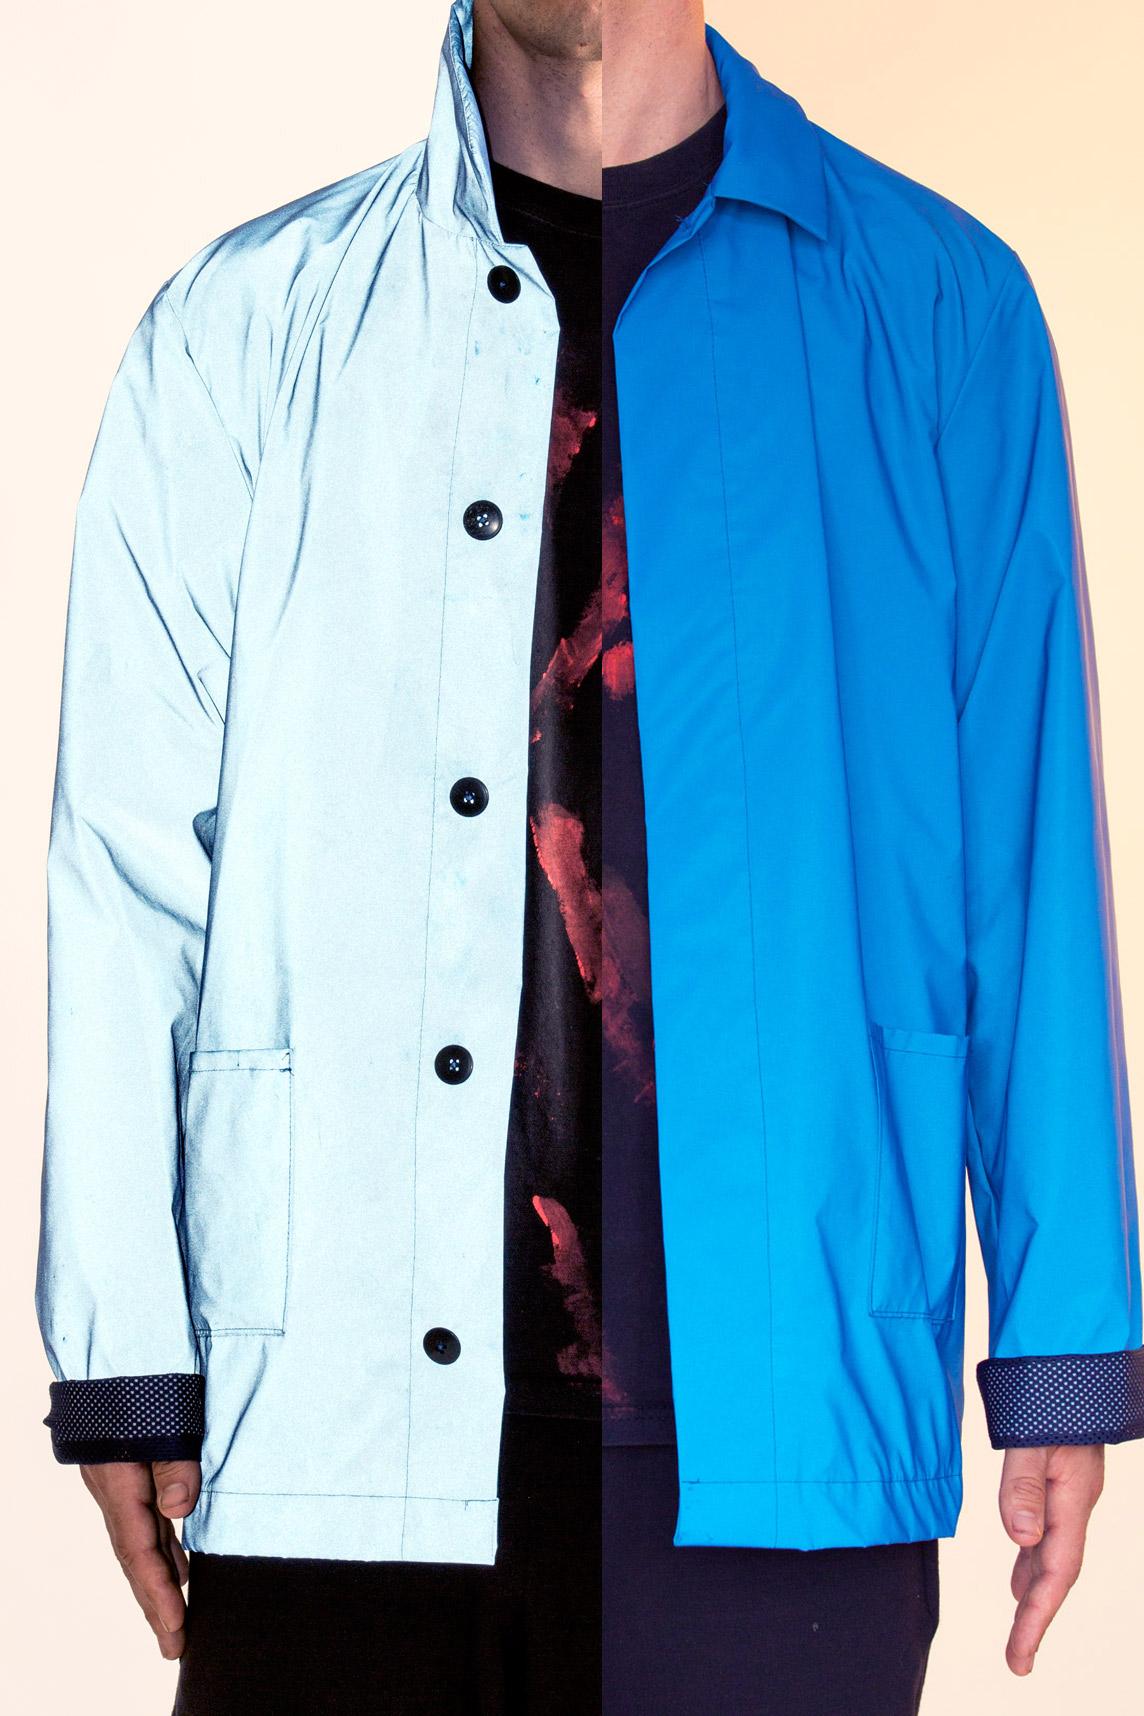 Blue Reflective Jacket